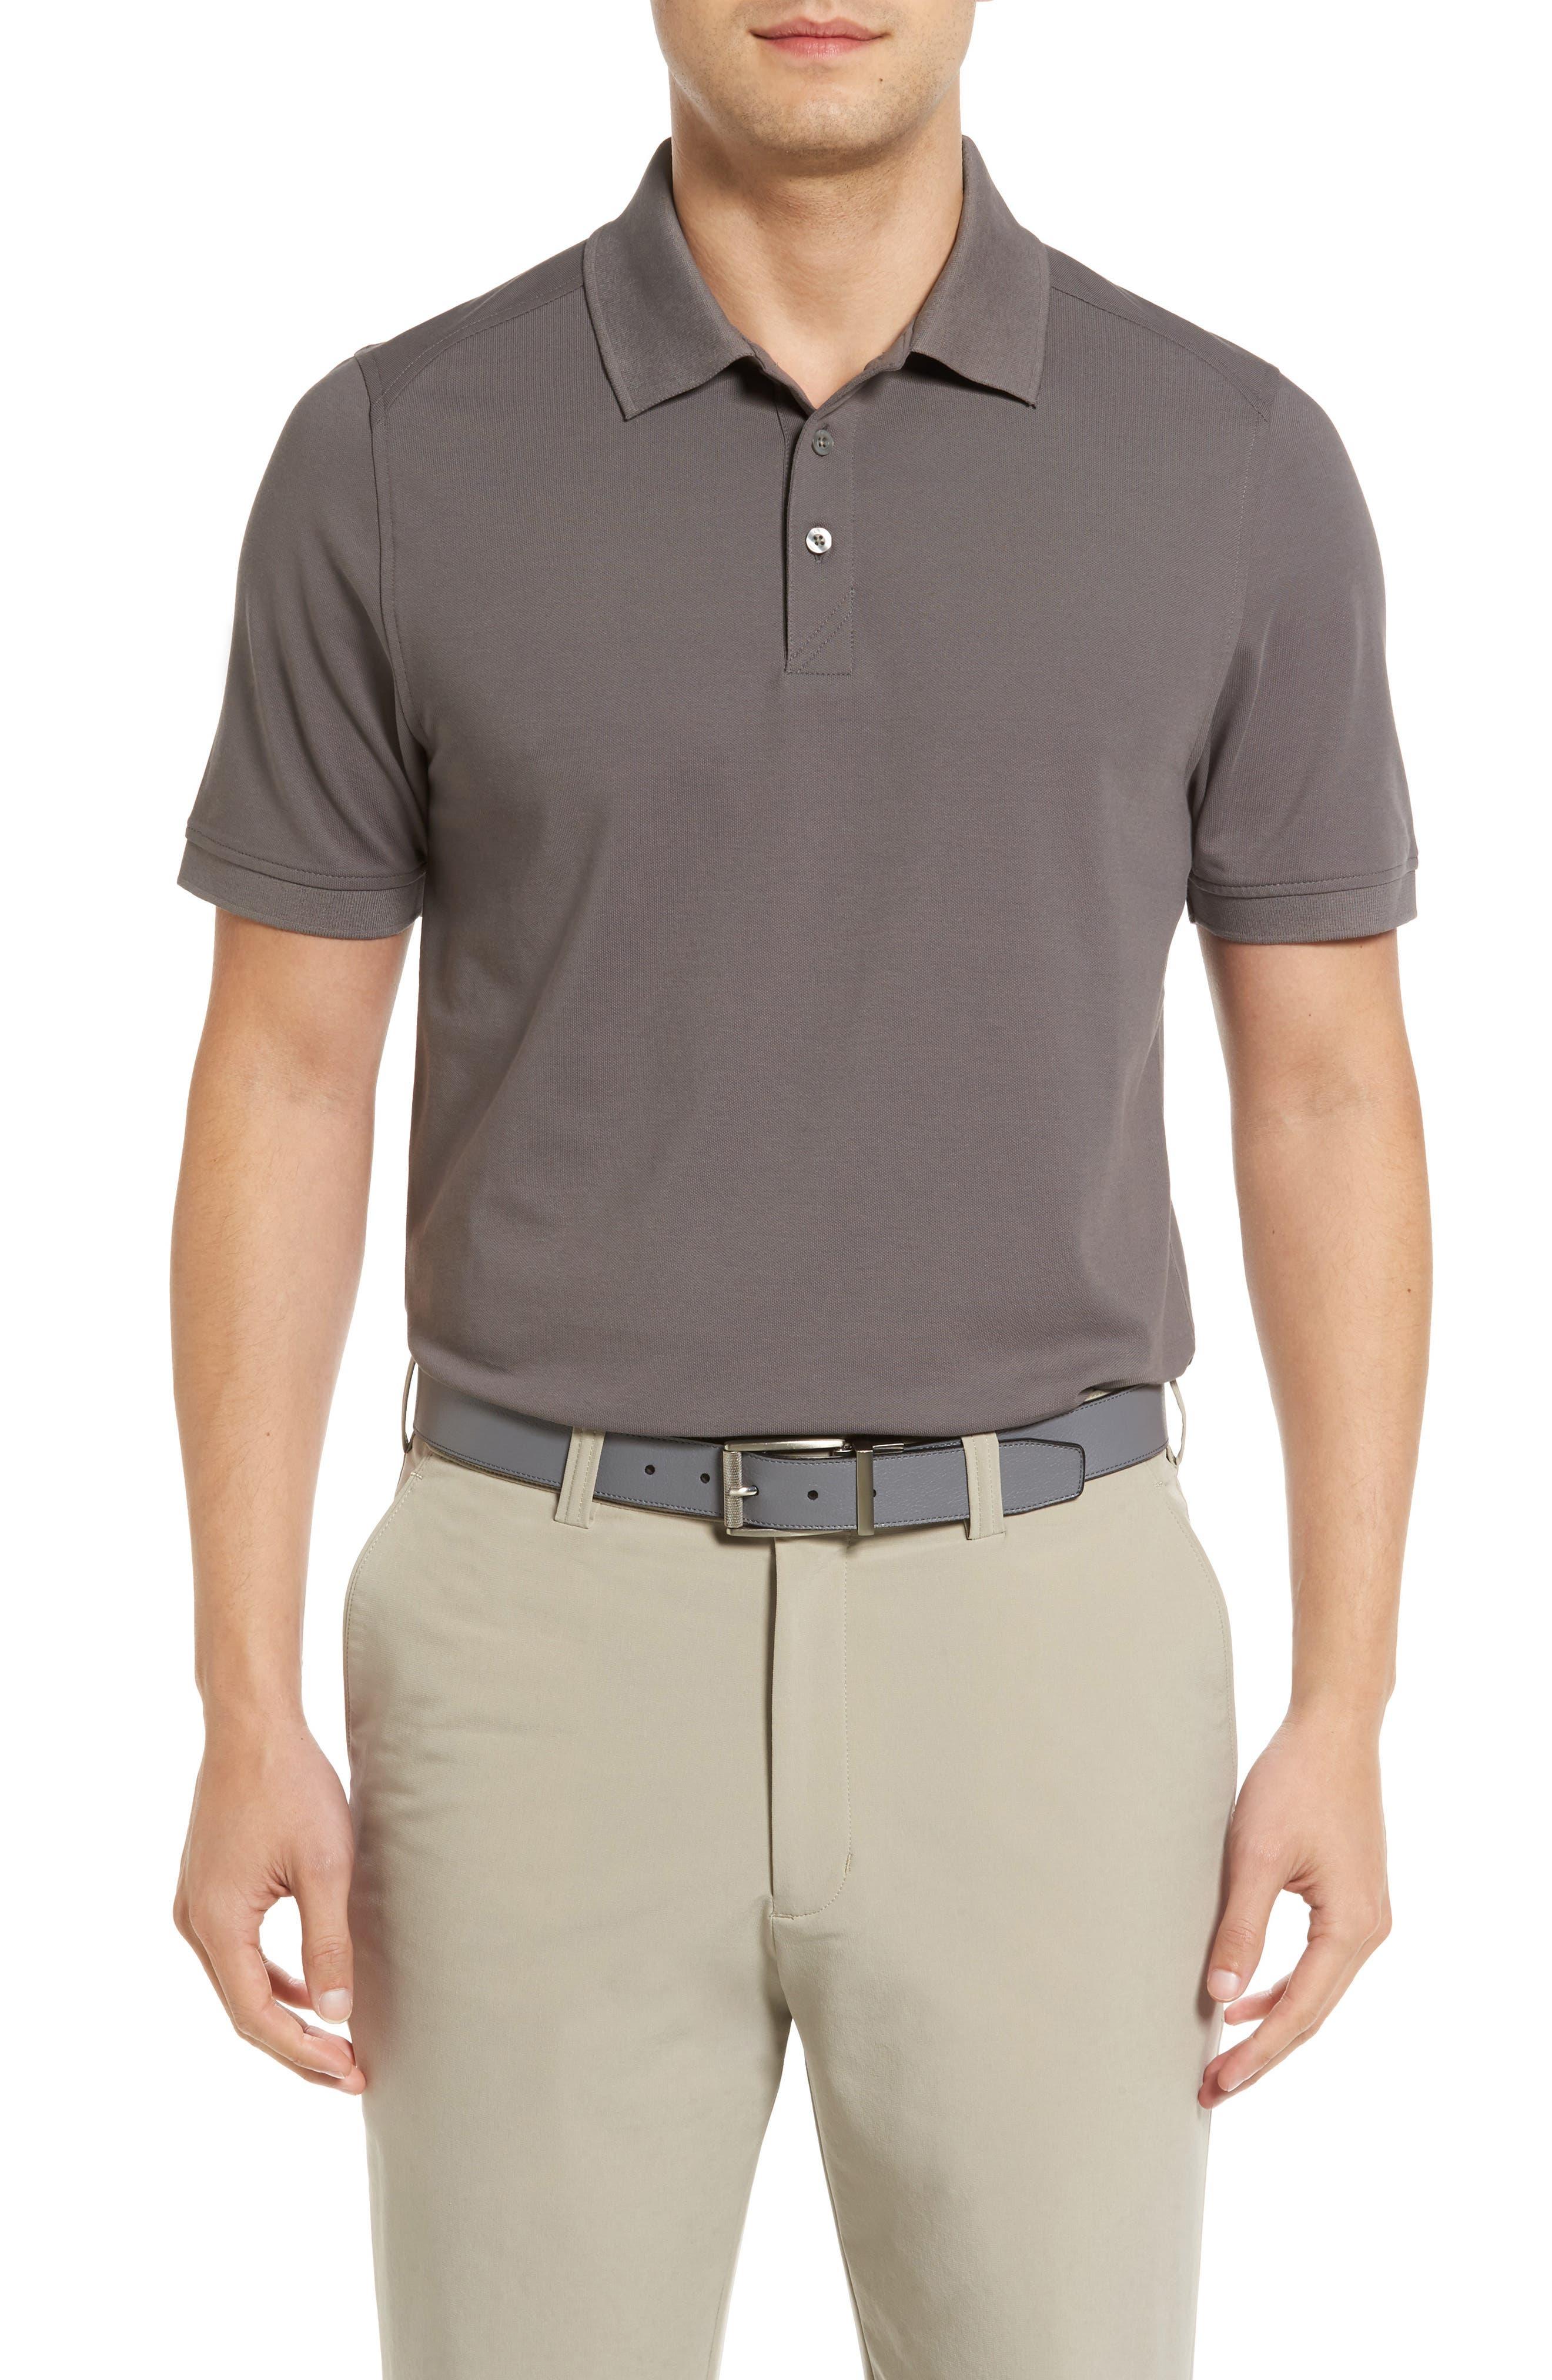 CUTTER & BUCK Advantage Golf Polo, Main, color, ELEMENTAL